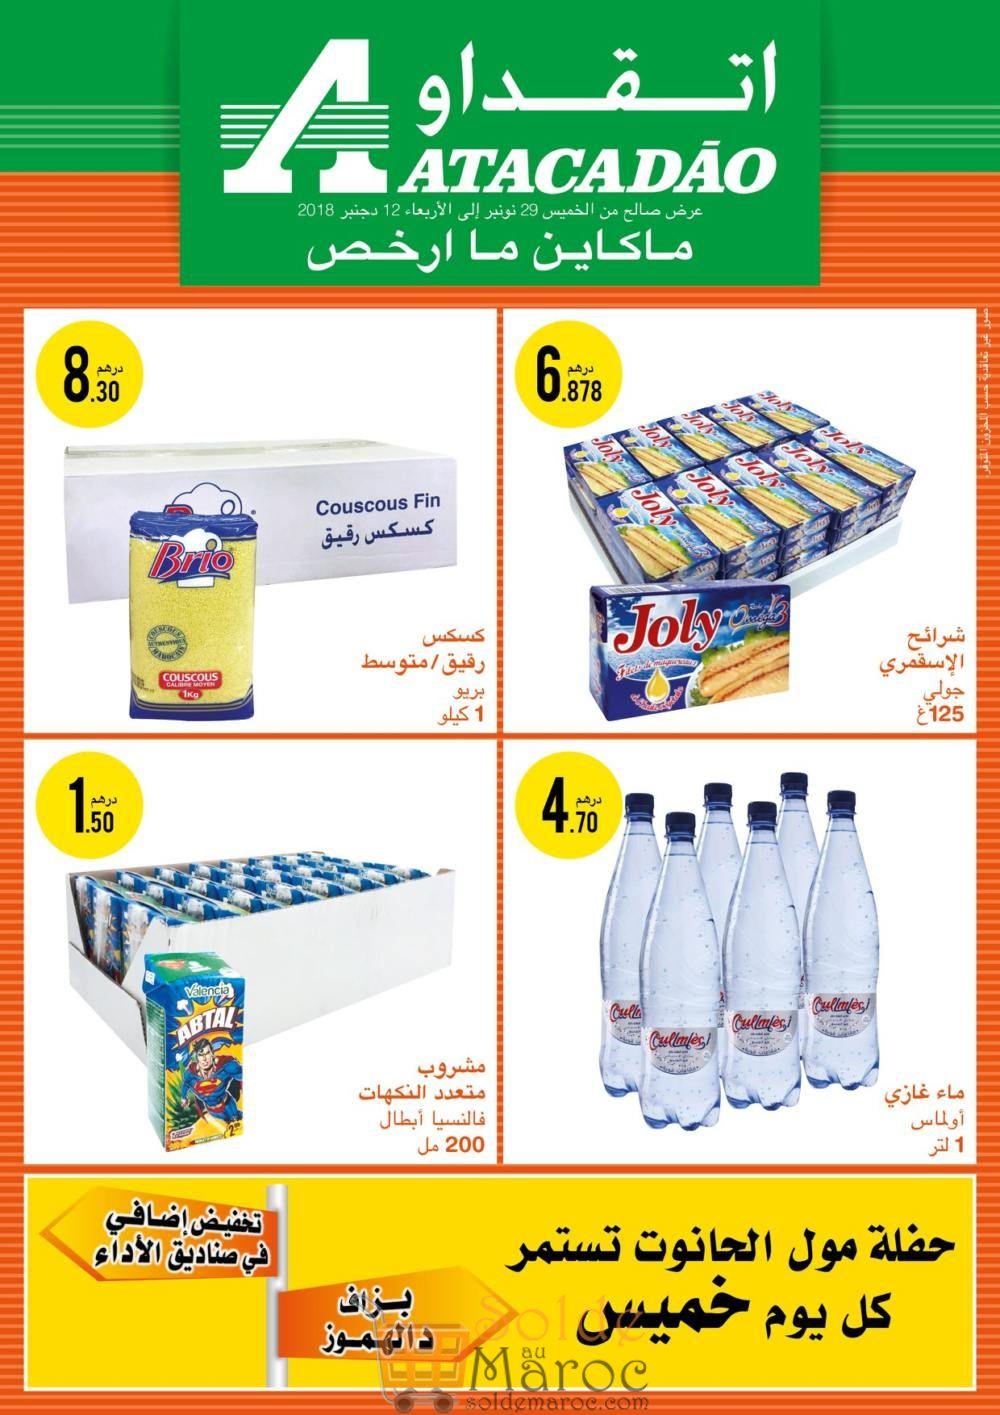 Catalogue Atacadao Maroc du 29 Novembre au 12 Décembre 2018